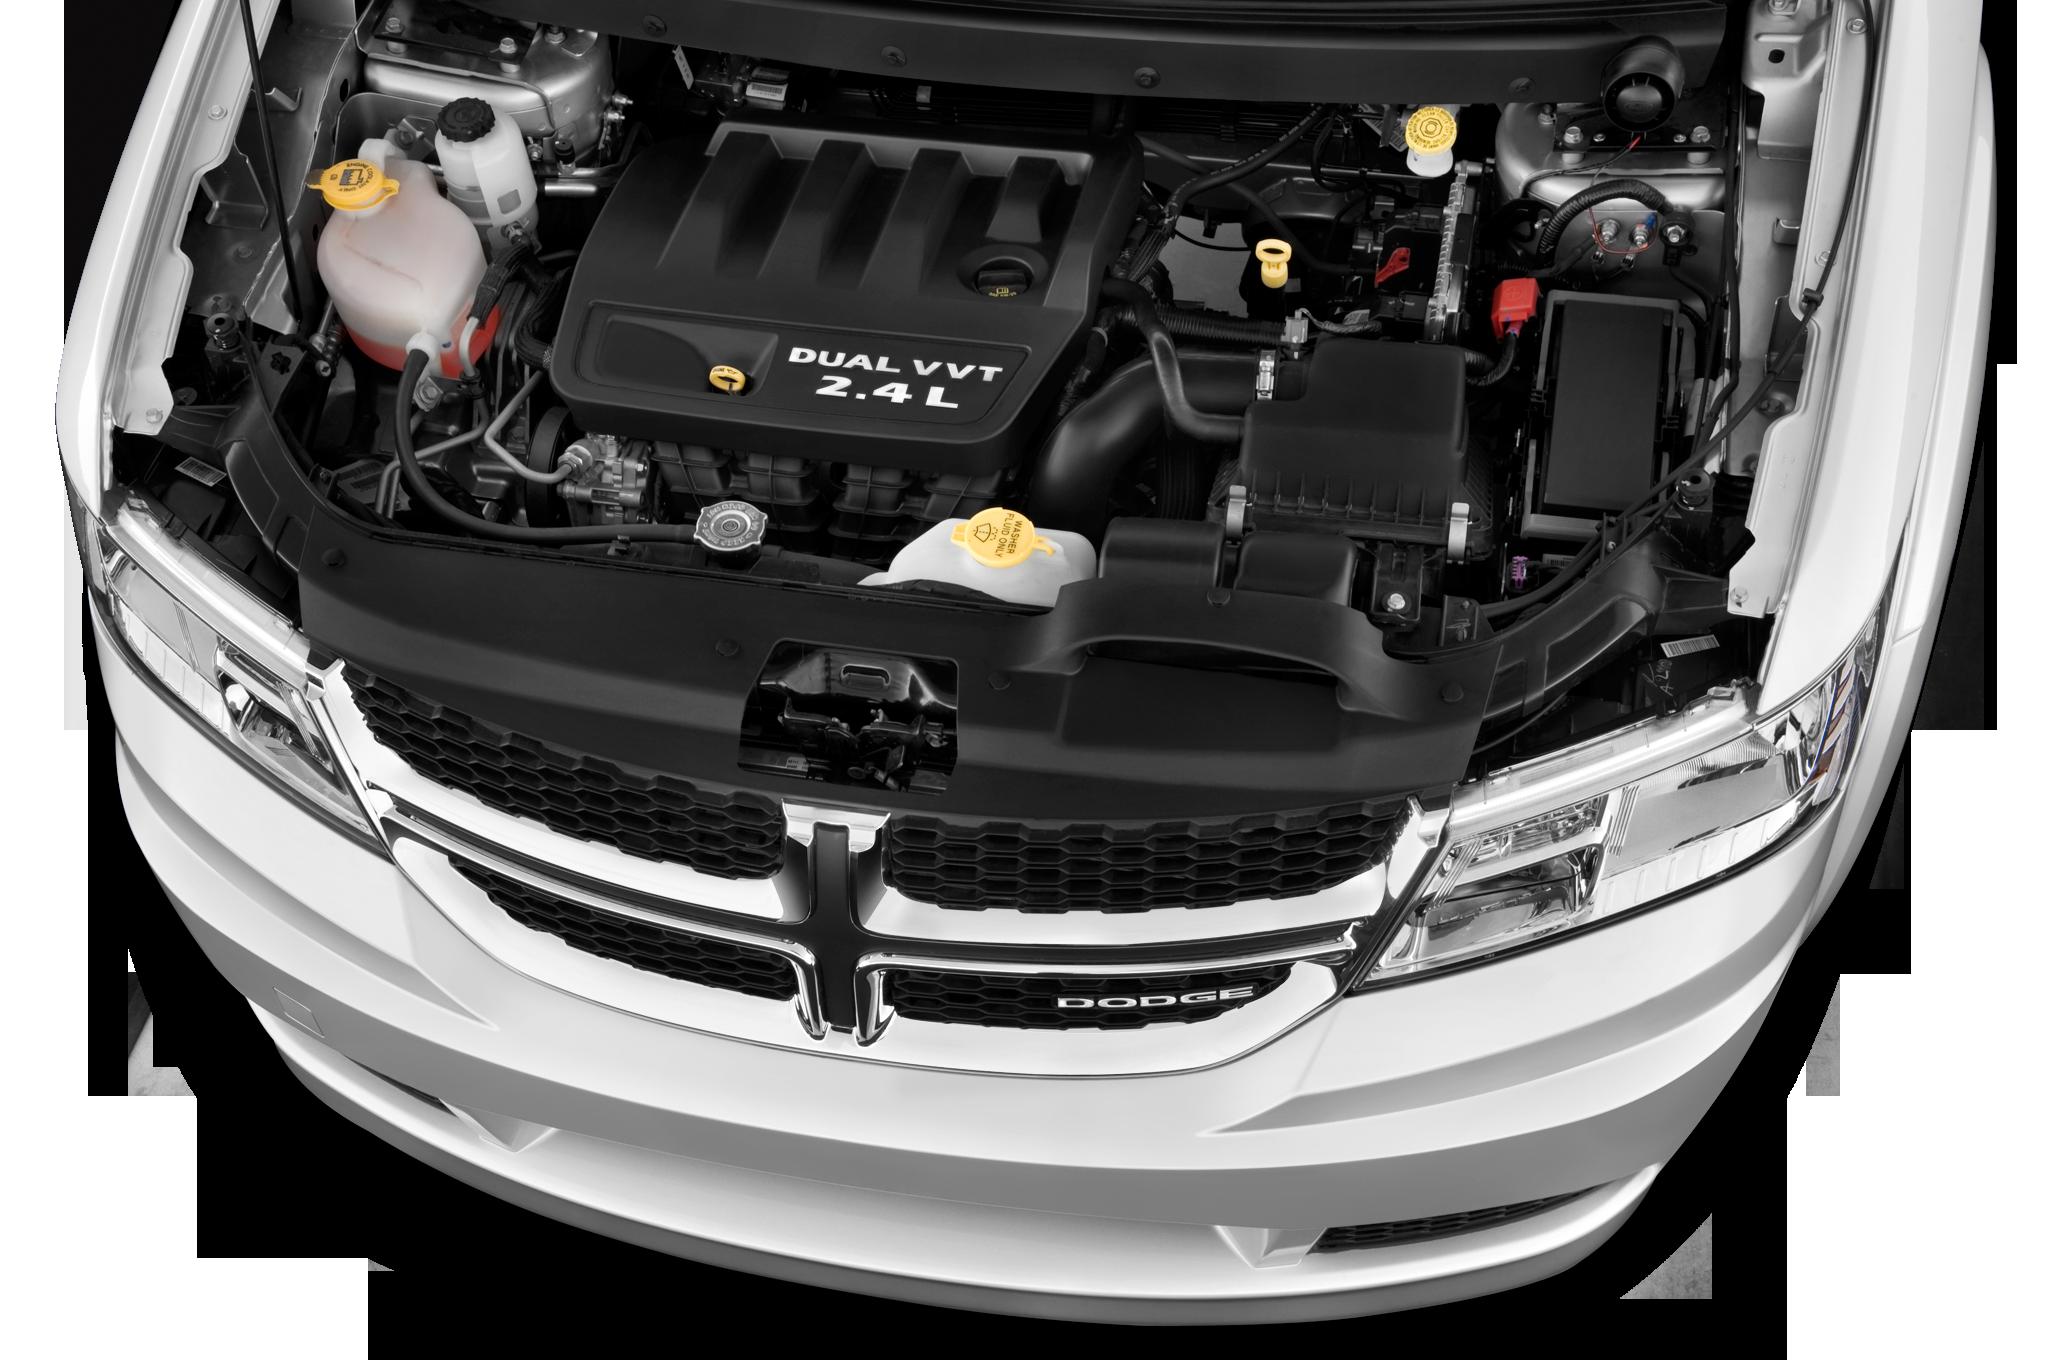 2015 Dodge Grand Caravan Engine Diagram Explained Wiring Diagrams 1999 2013 Journey Block And Schematic U2022 Transmission